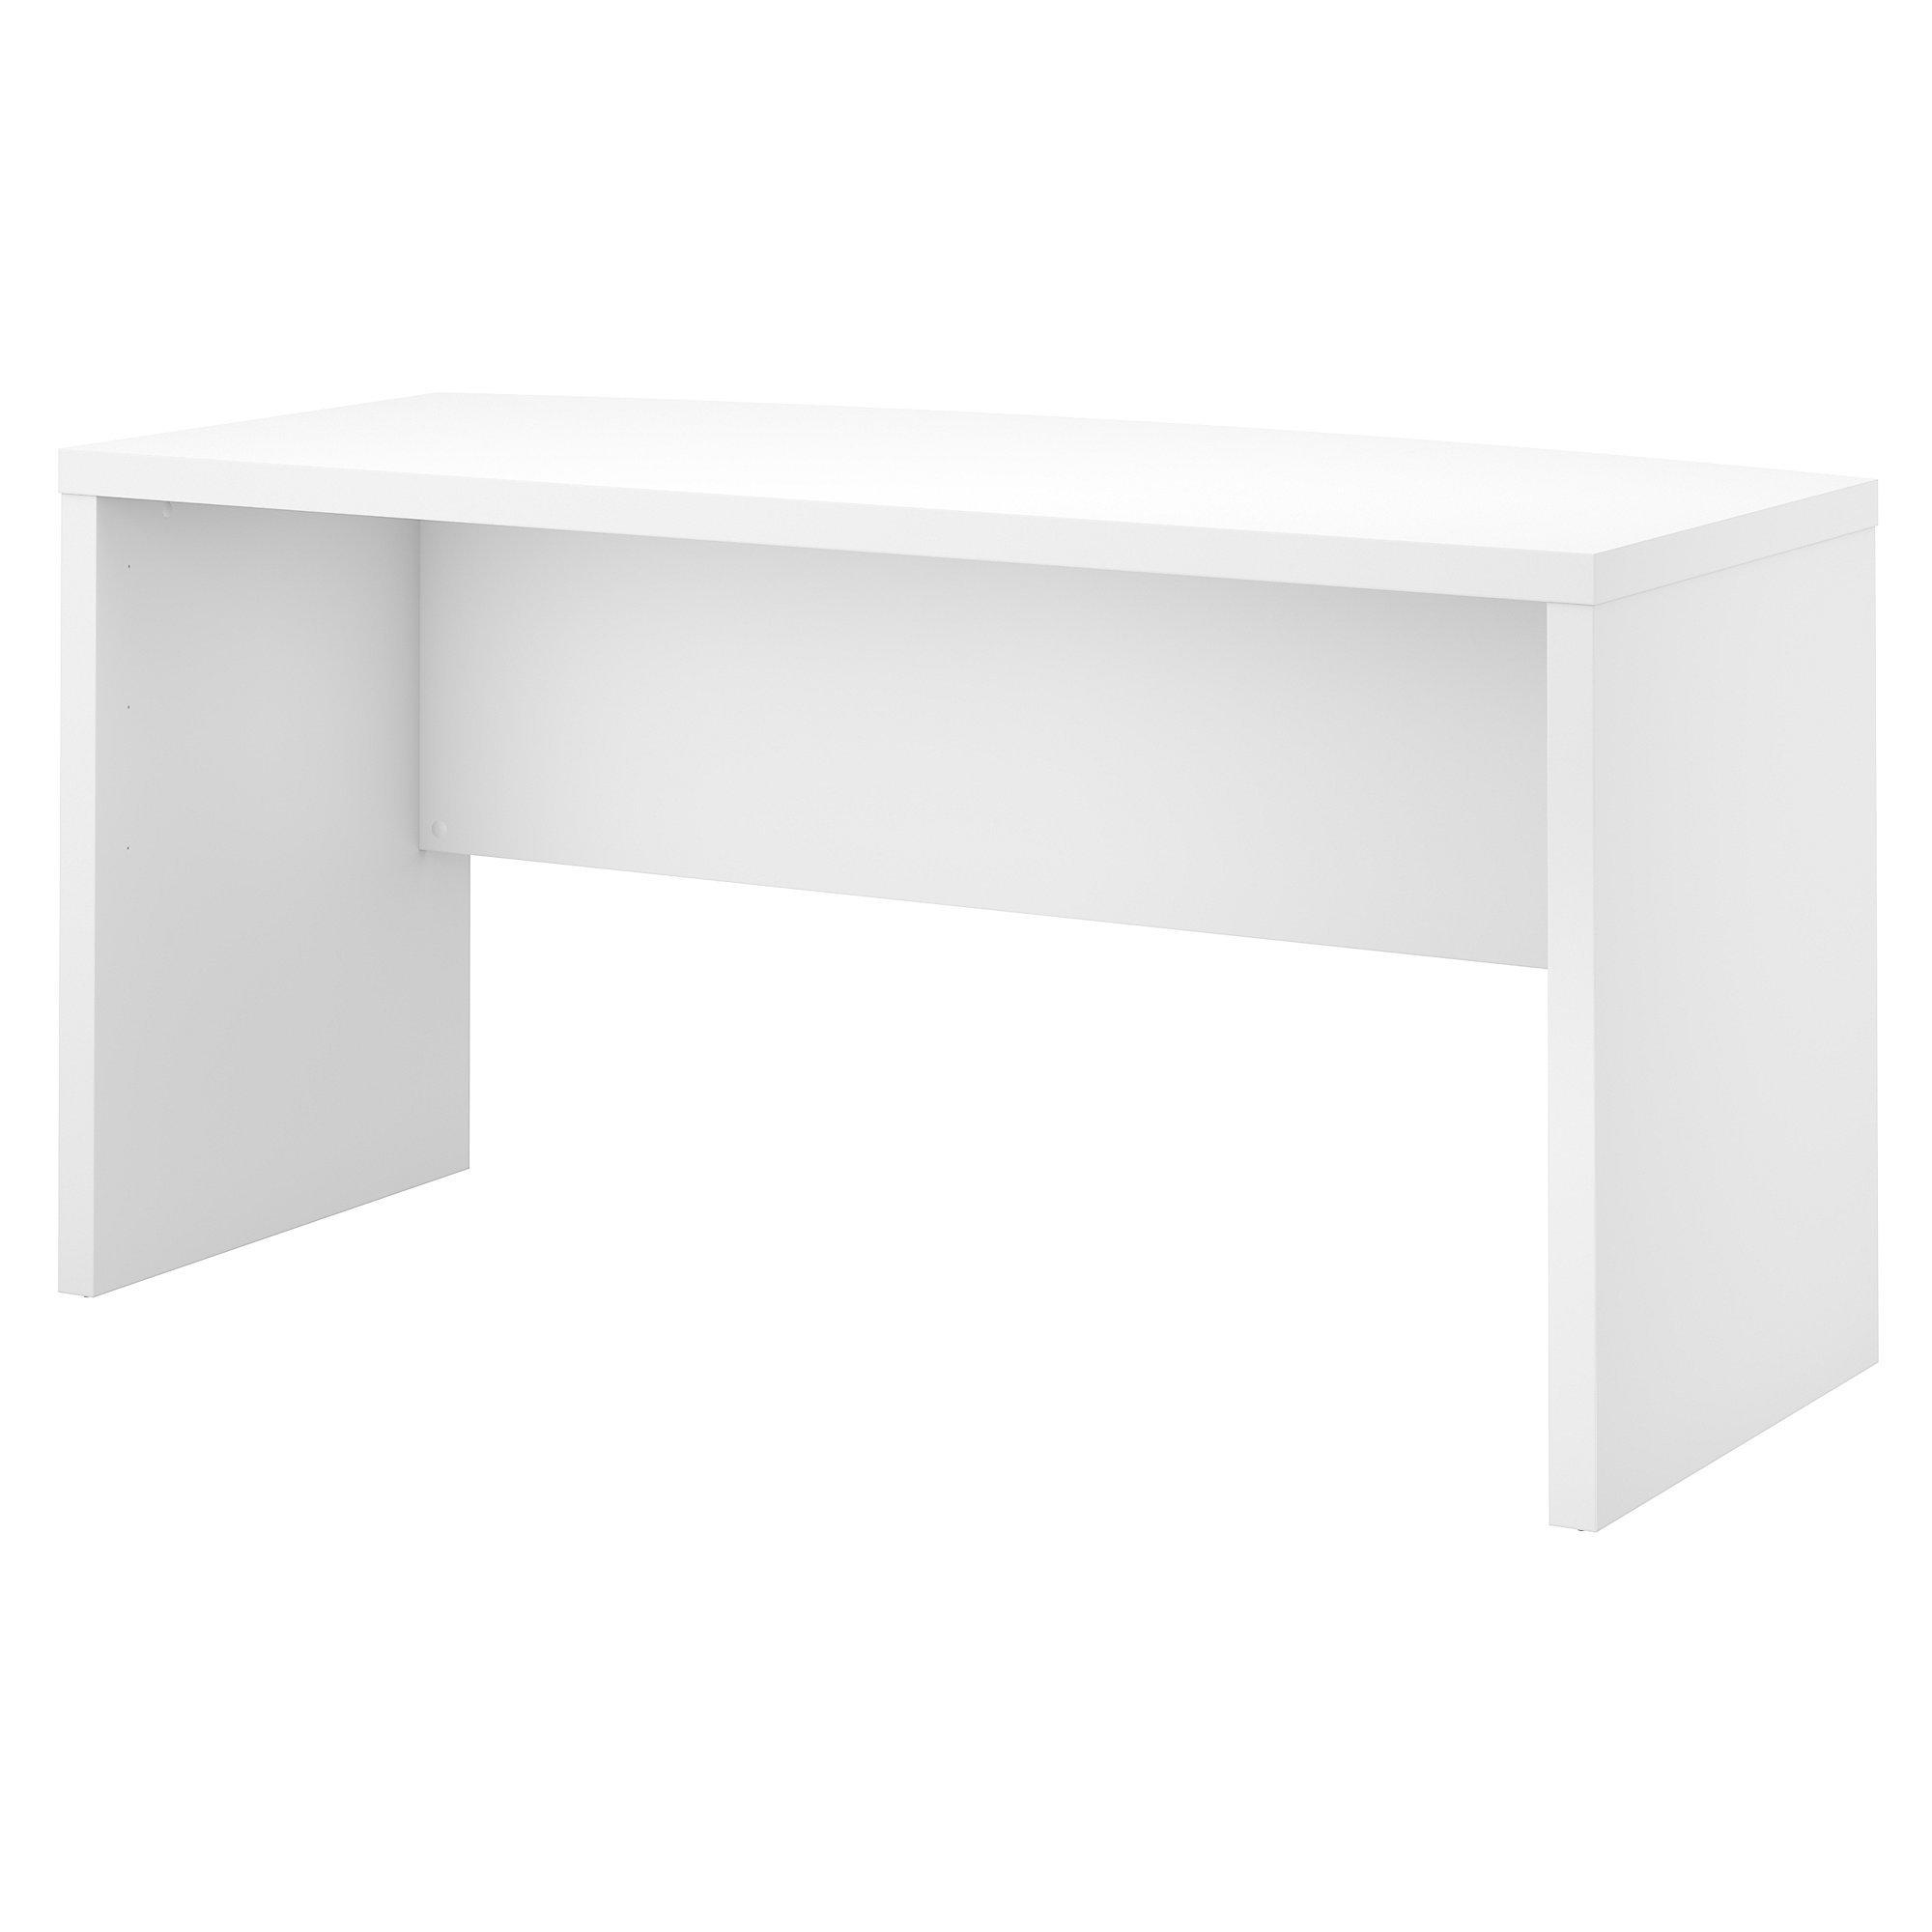 Office by kathy ireland Echo 60W Bow Front Desk in Pure White by Office by kathy ireland